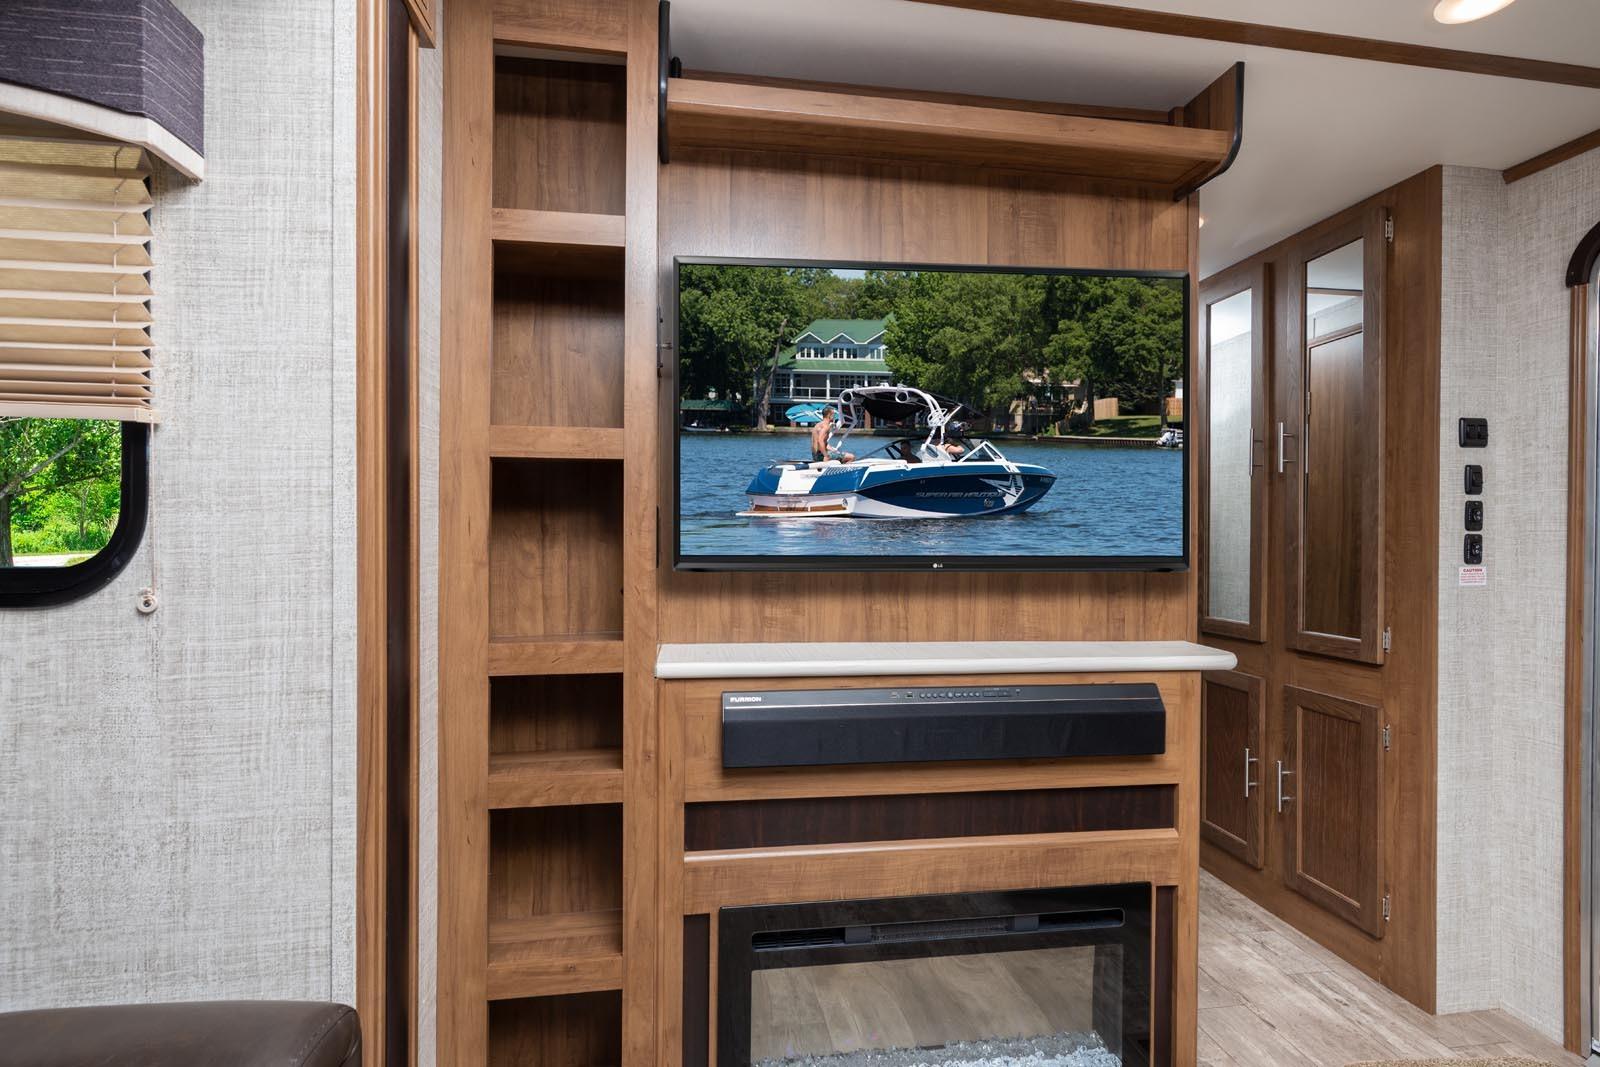 Gulf Stream Kingsport 299SBW Image